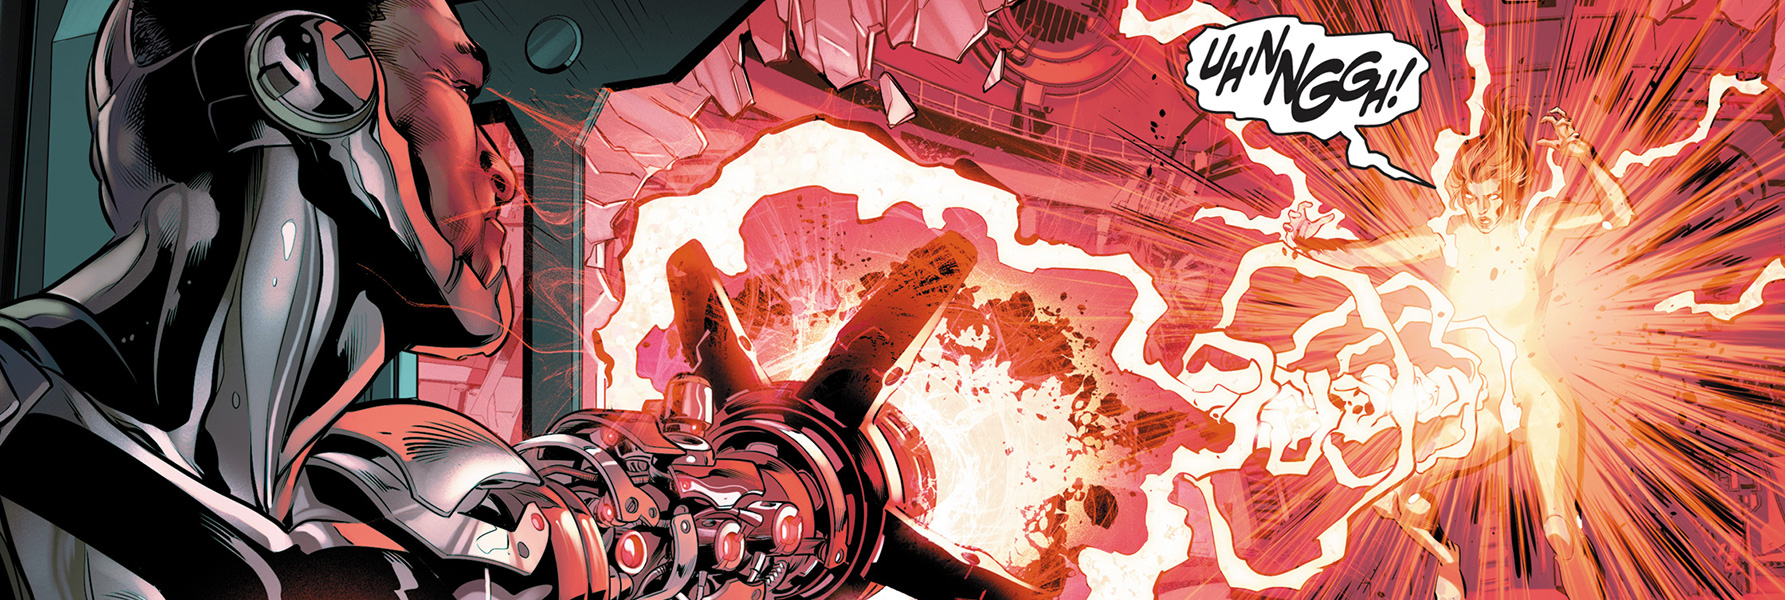 cyborg-powers-CYBORG06004-v1.jpg